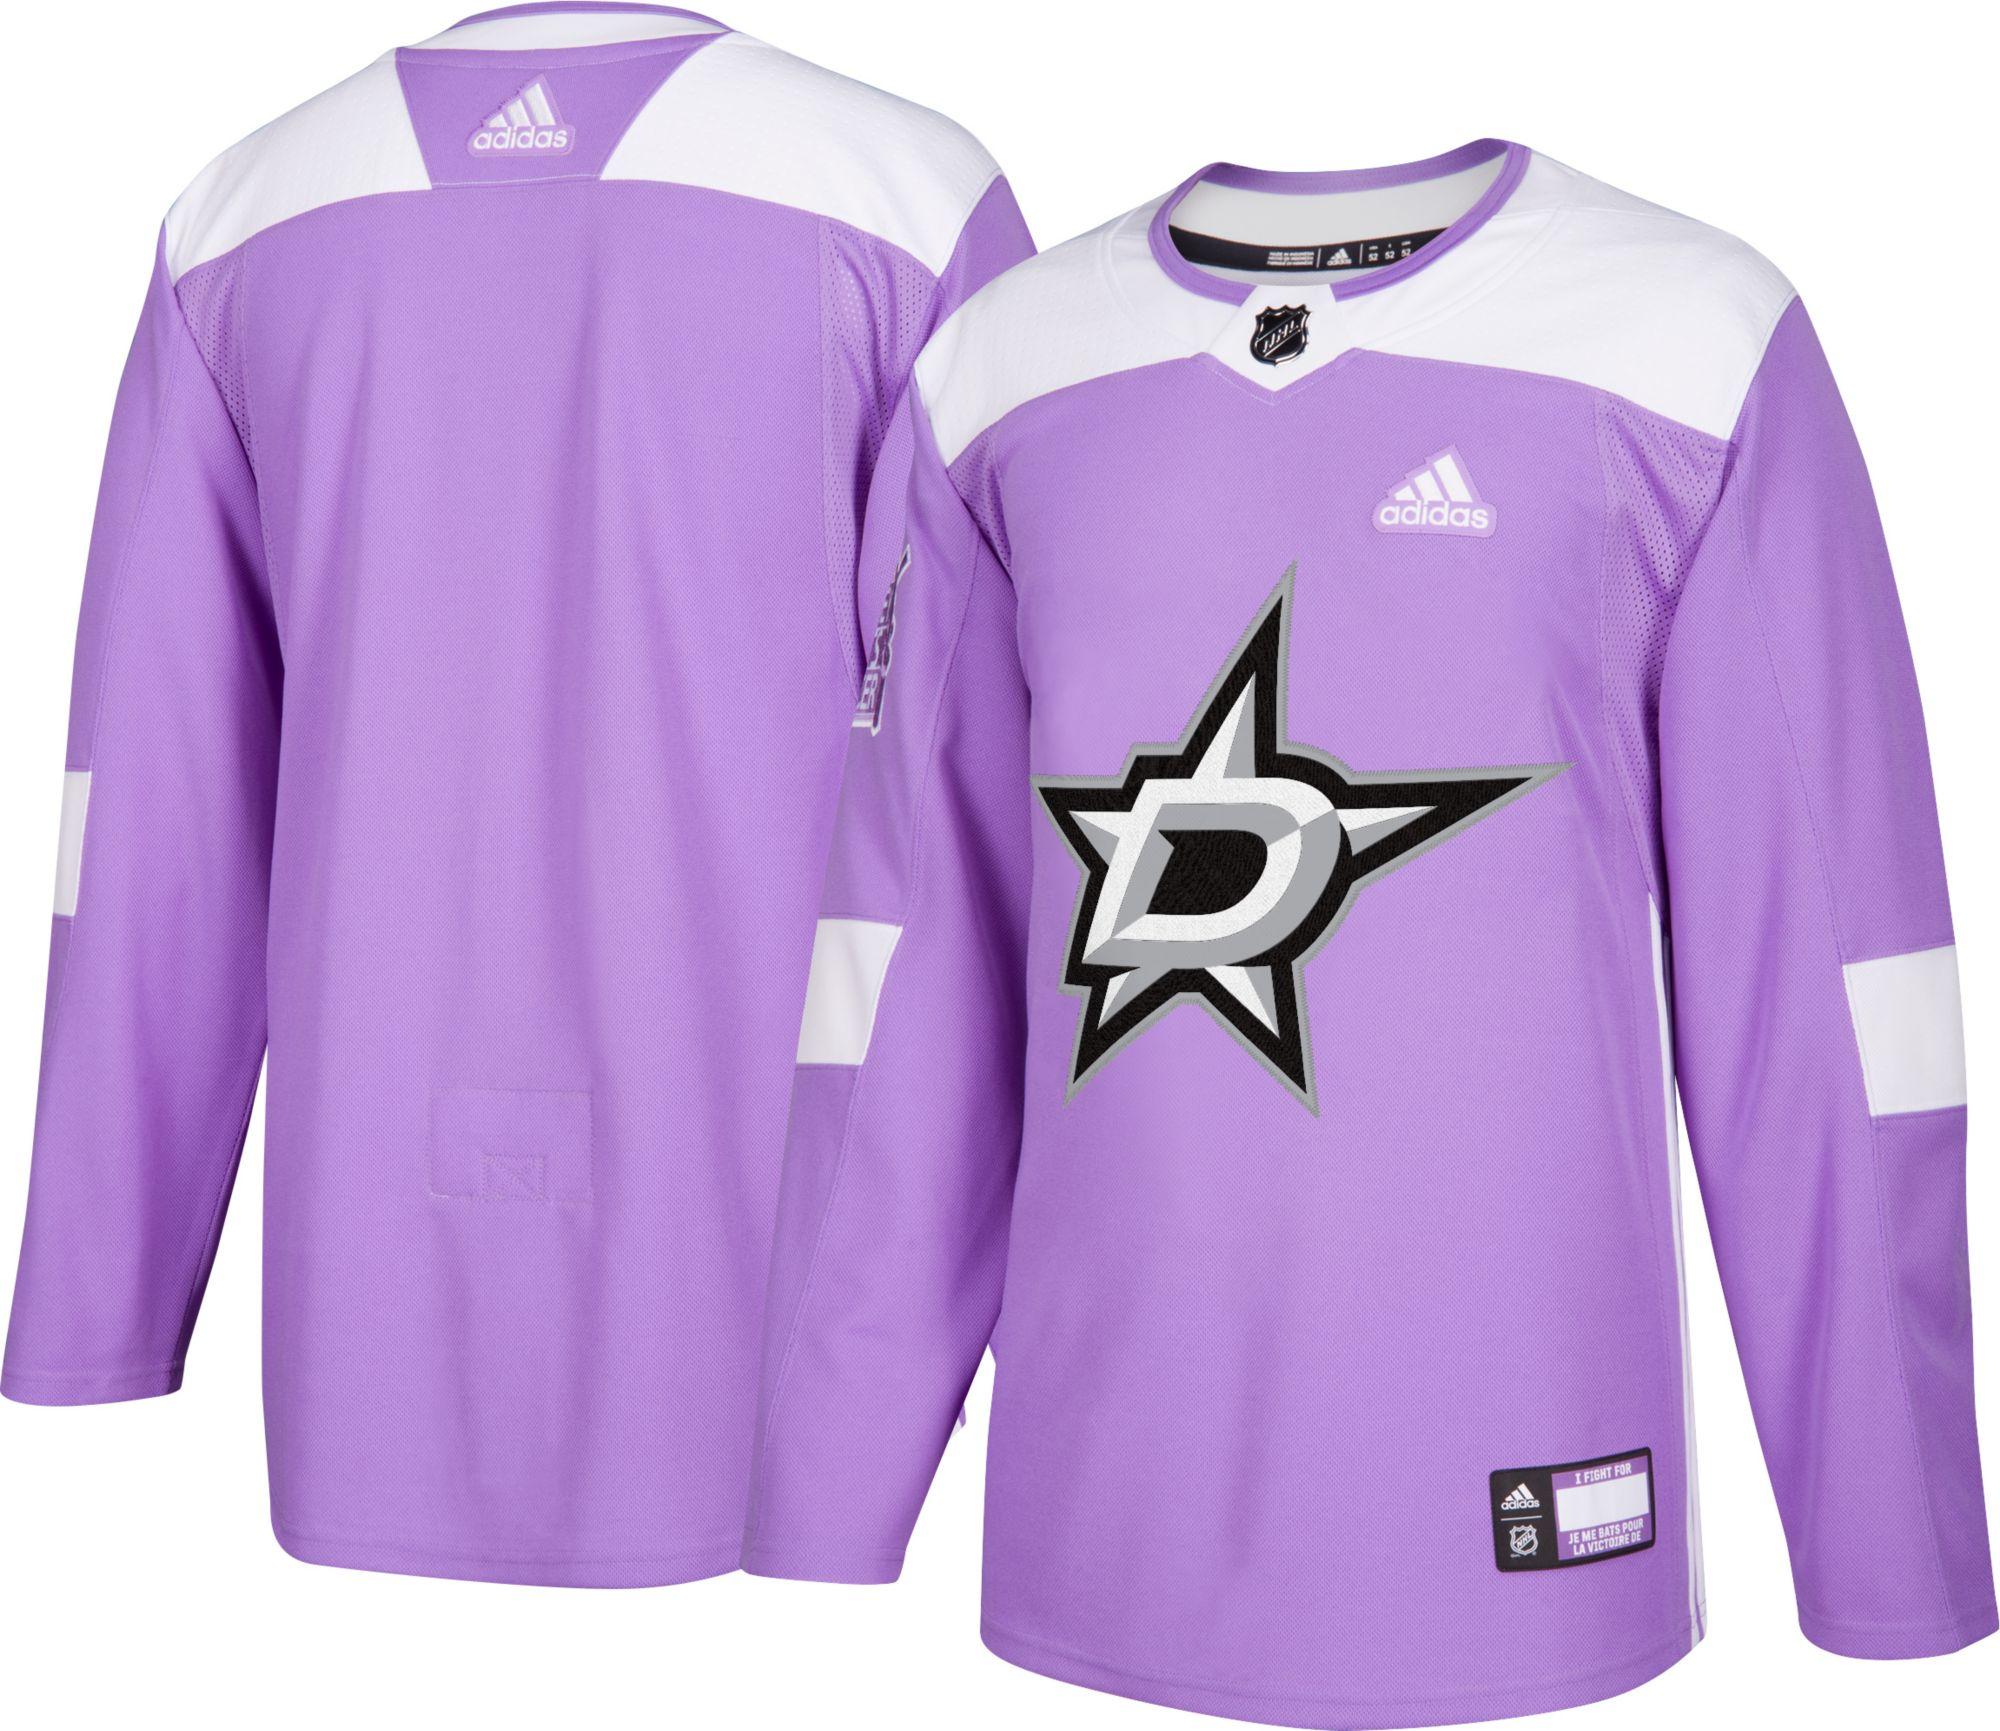 69083d25 ... adidas Mens Dallas Stars Hockey Fights Cancer Authentic Pro Mens Dallas  Stars Reebok Purple ...